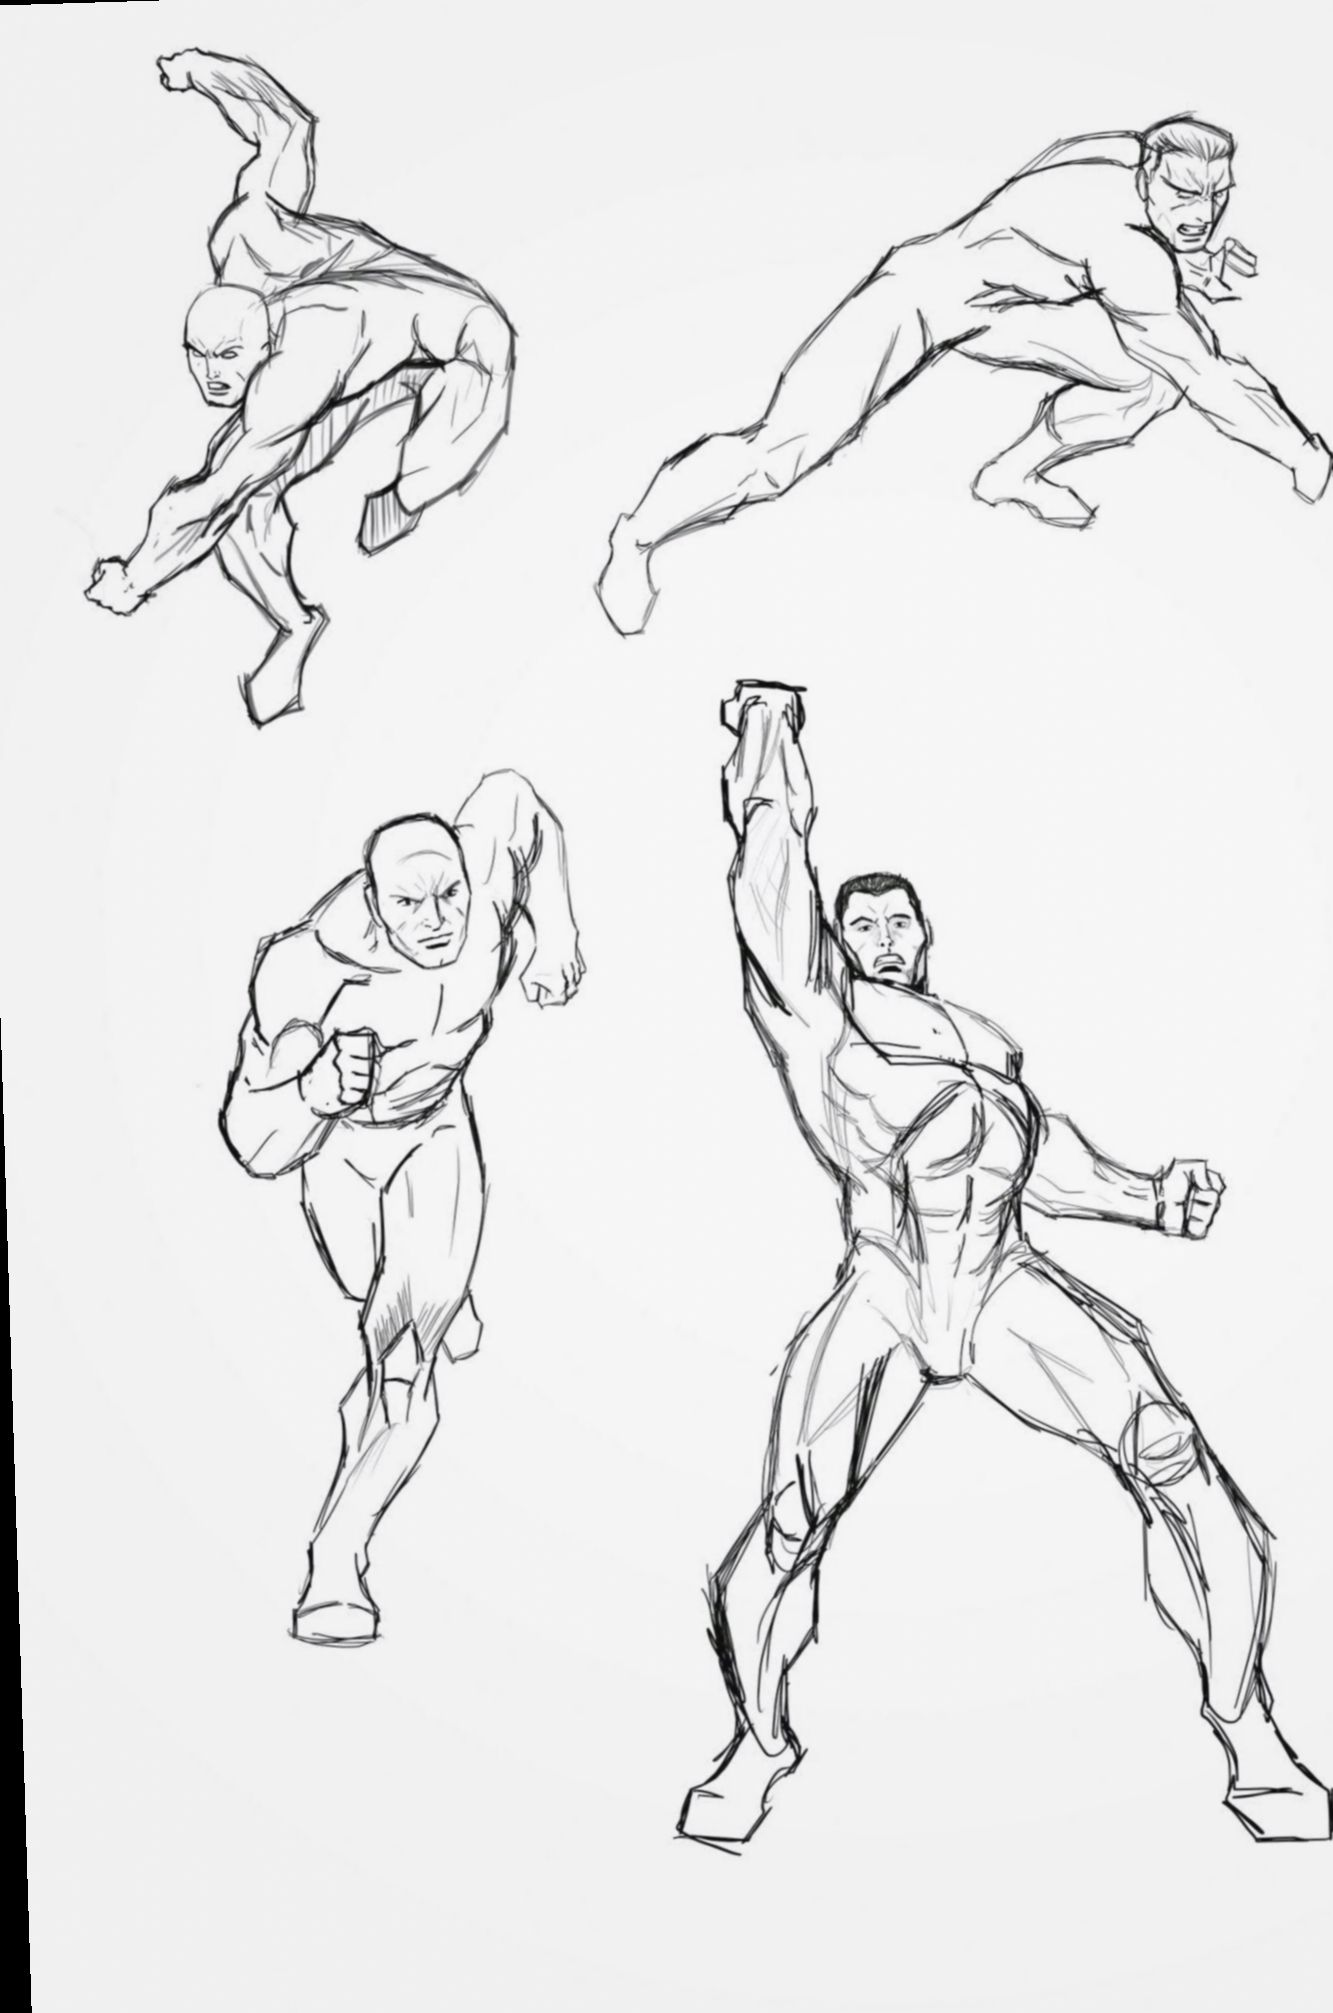 Anime Poses Action Comic Bakugoukatsuki Bakugou Bnha In 2020 Male Body Art Action Poses Anime Poses